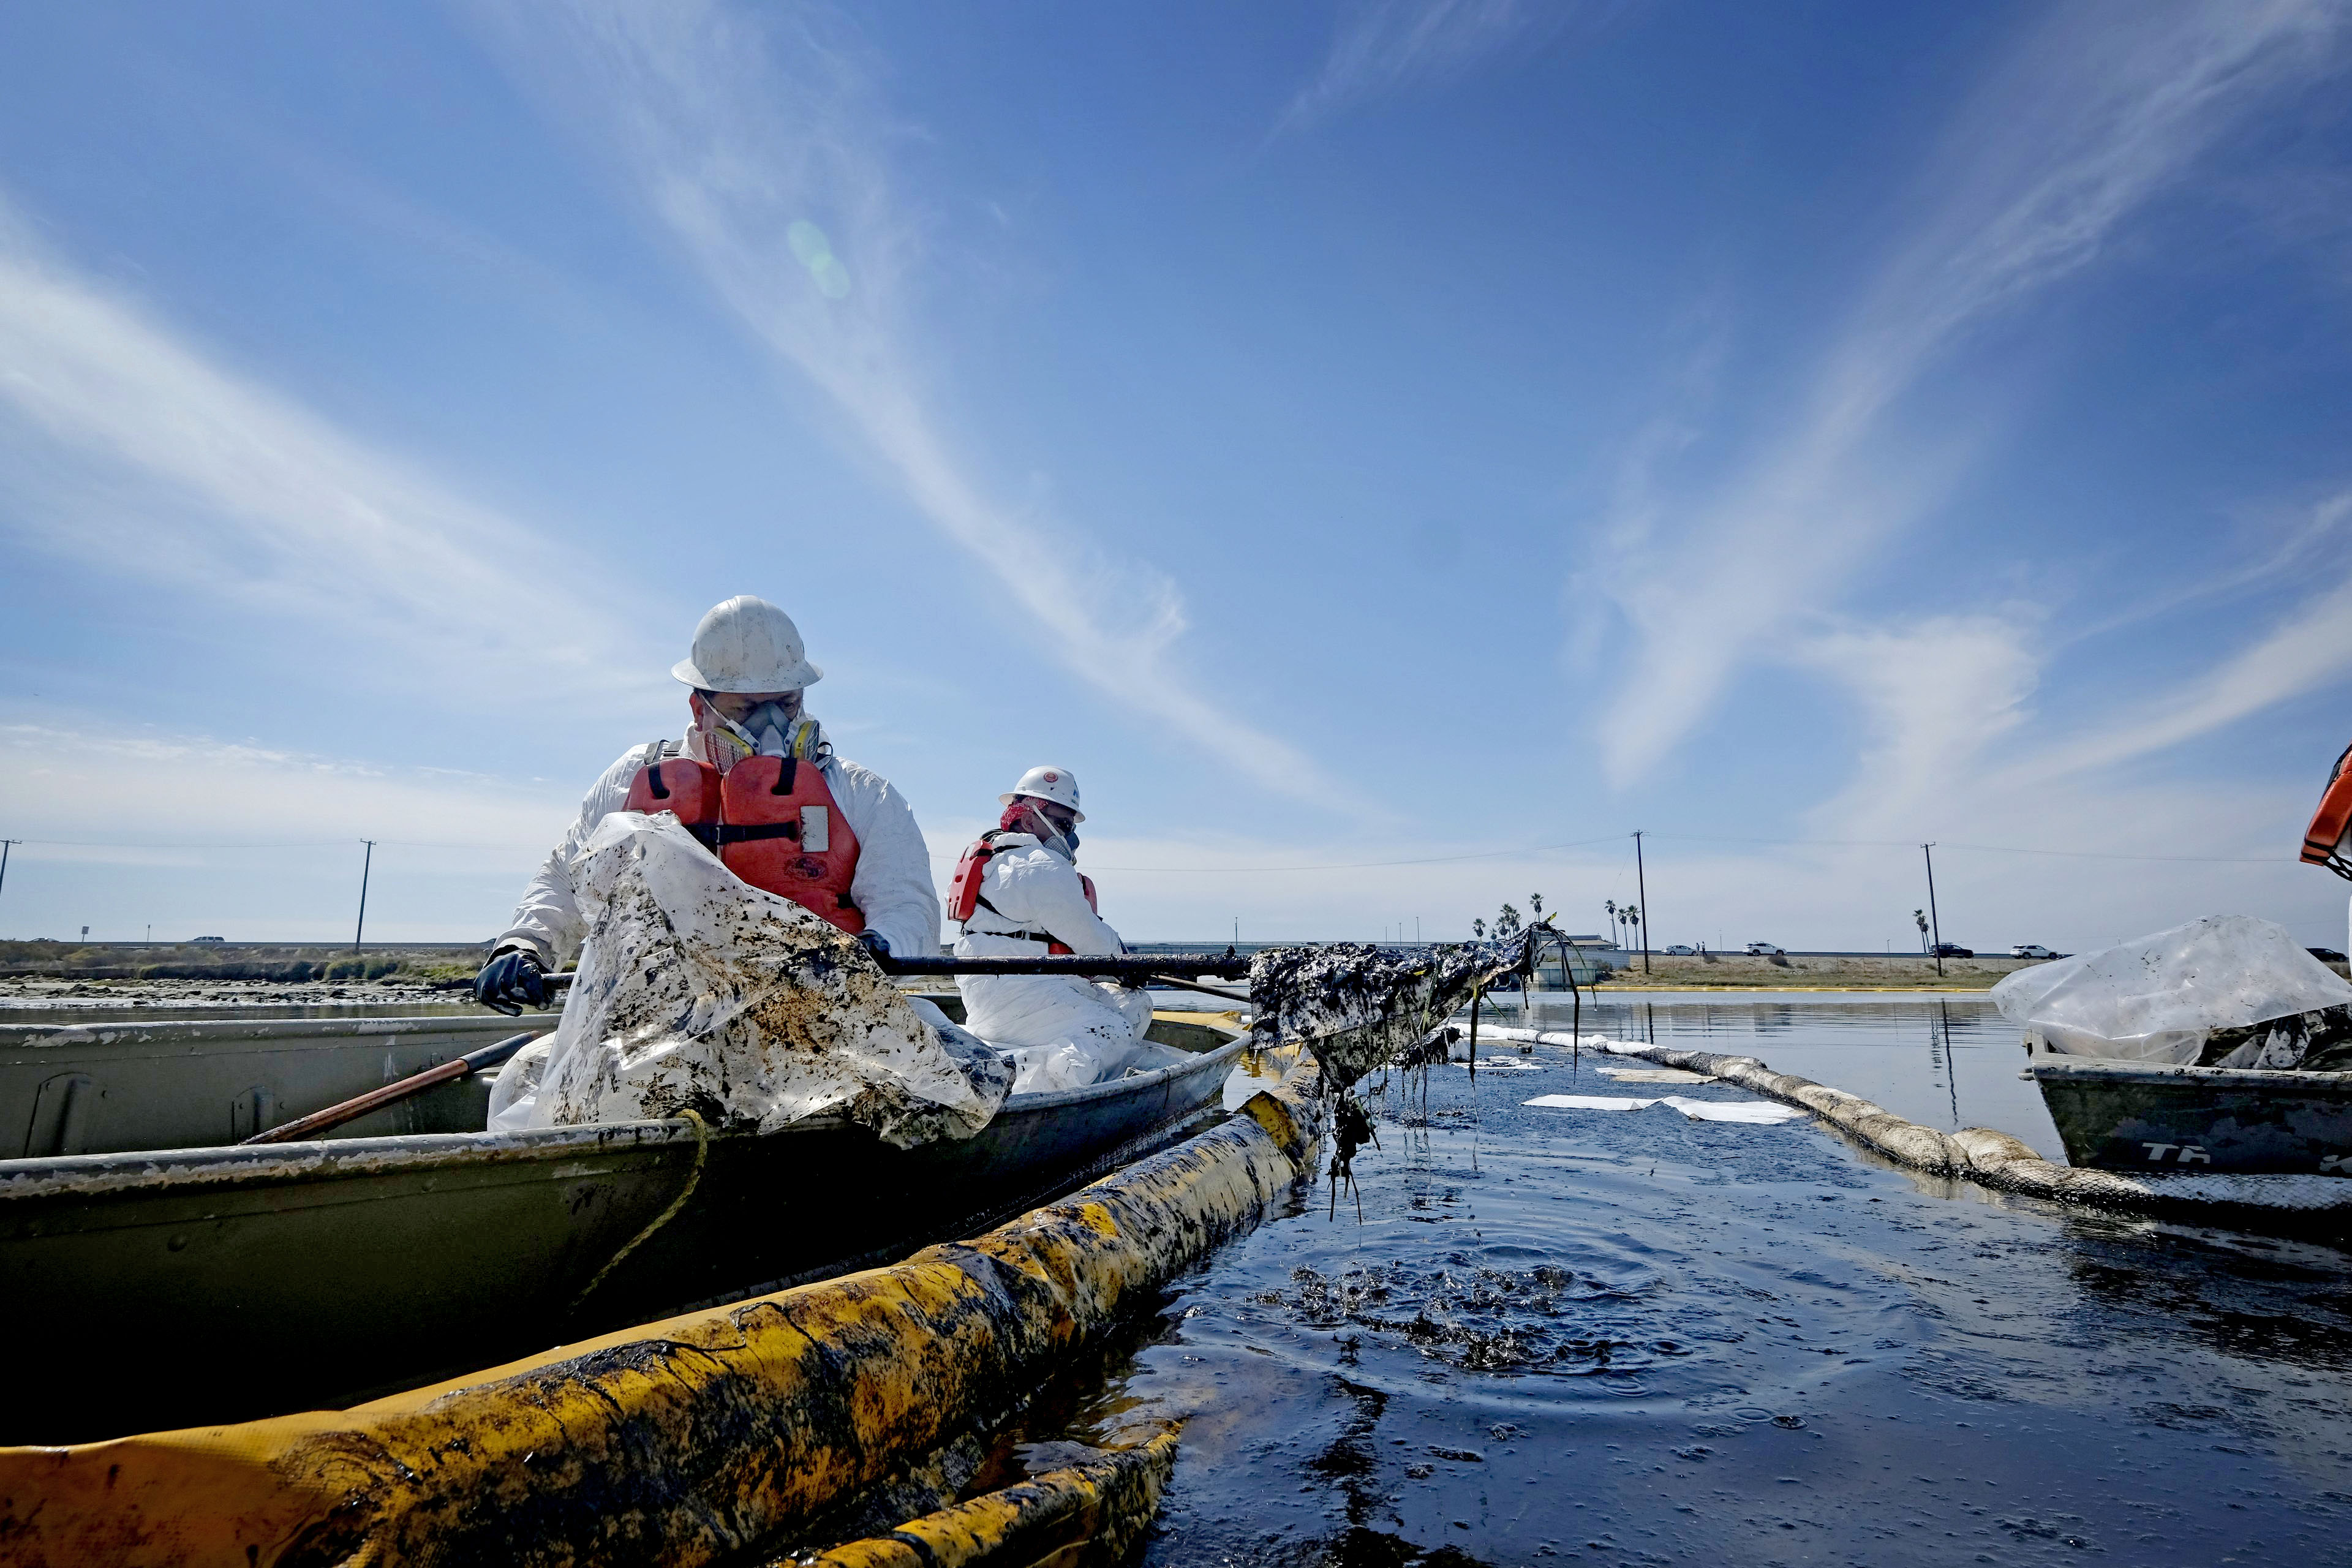 California pipeline shut down after 'worst case' scenario oil spill